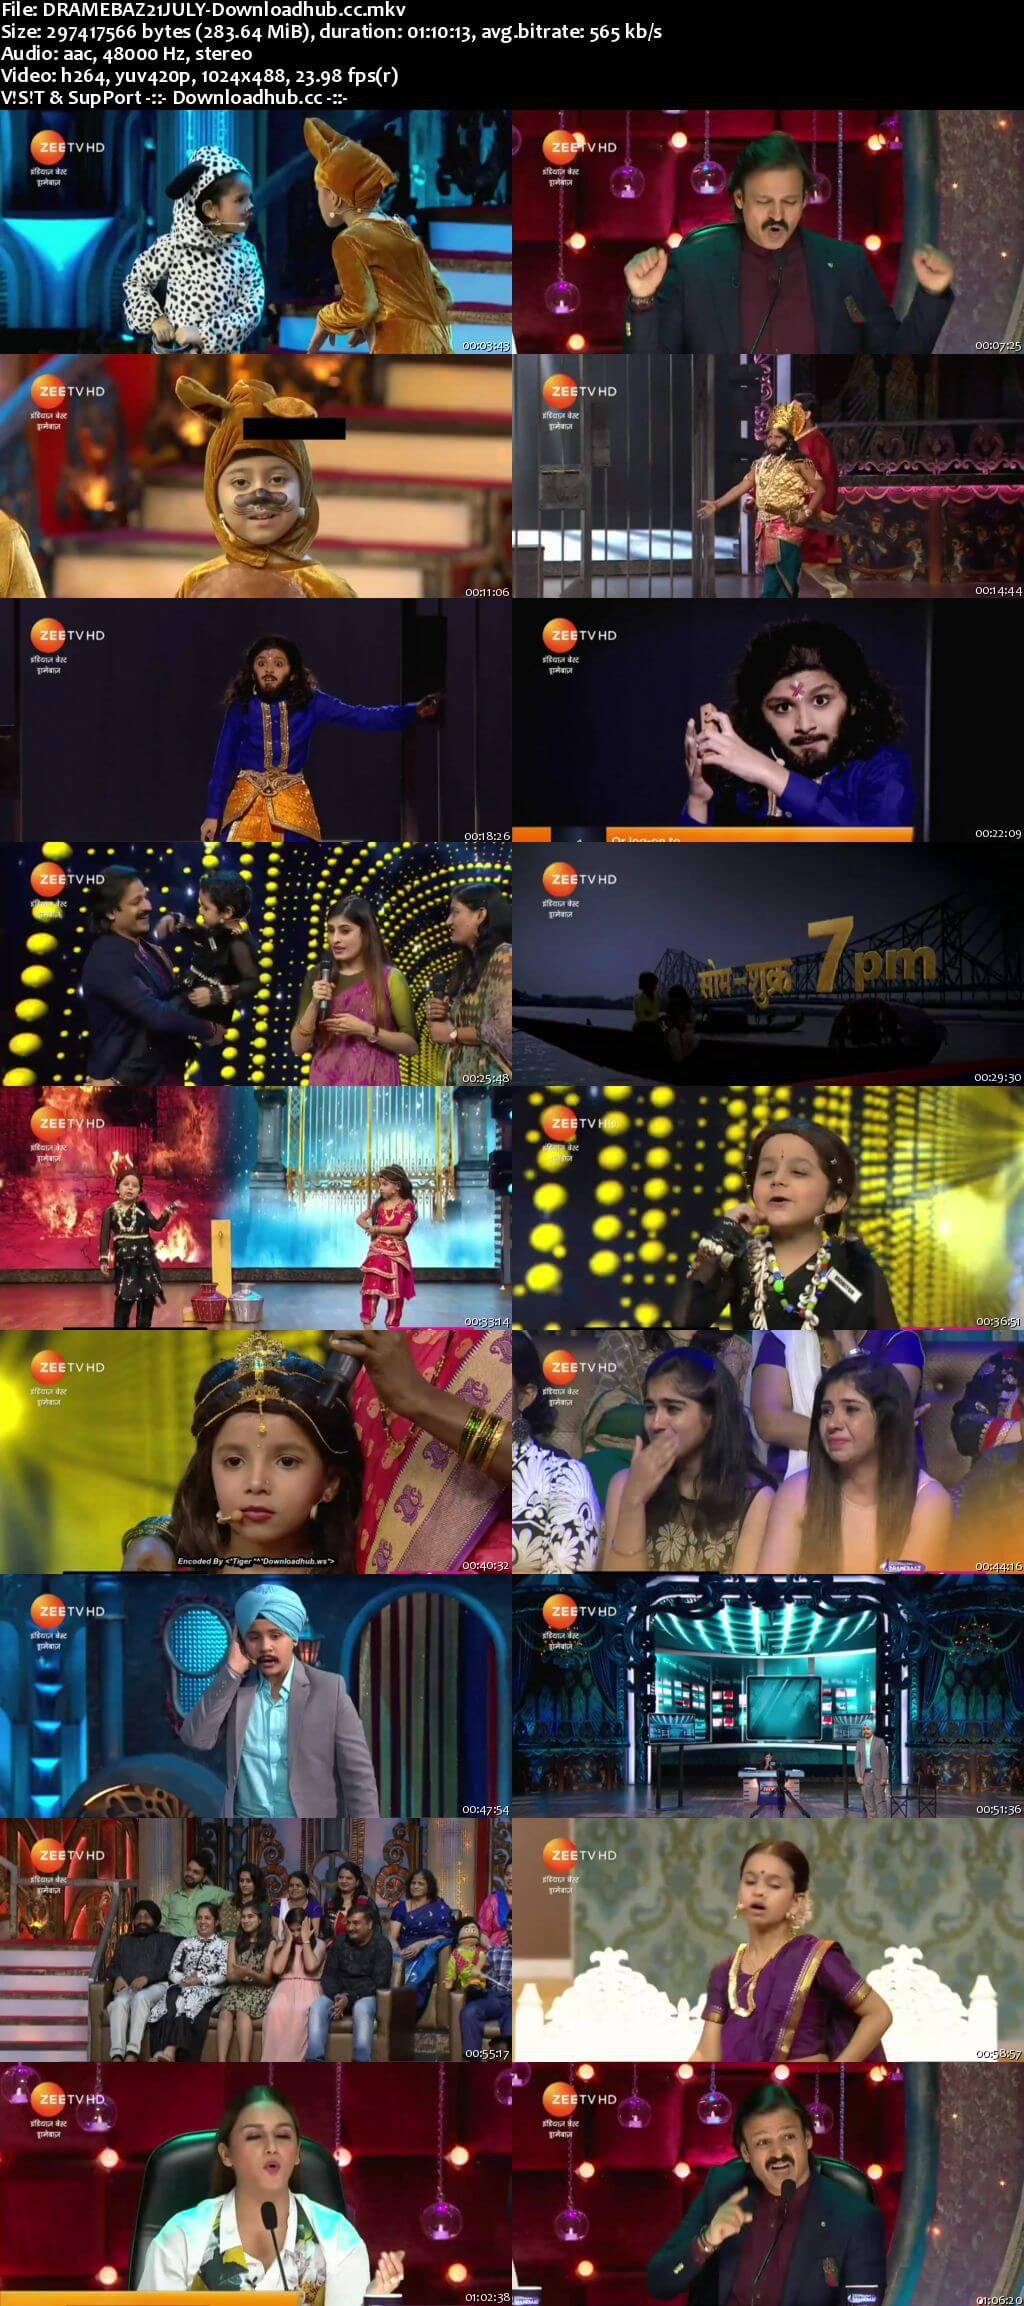 Indias Best Dramebaaz Season 3 21 July 2018 Episode 07 HDTV 480p